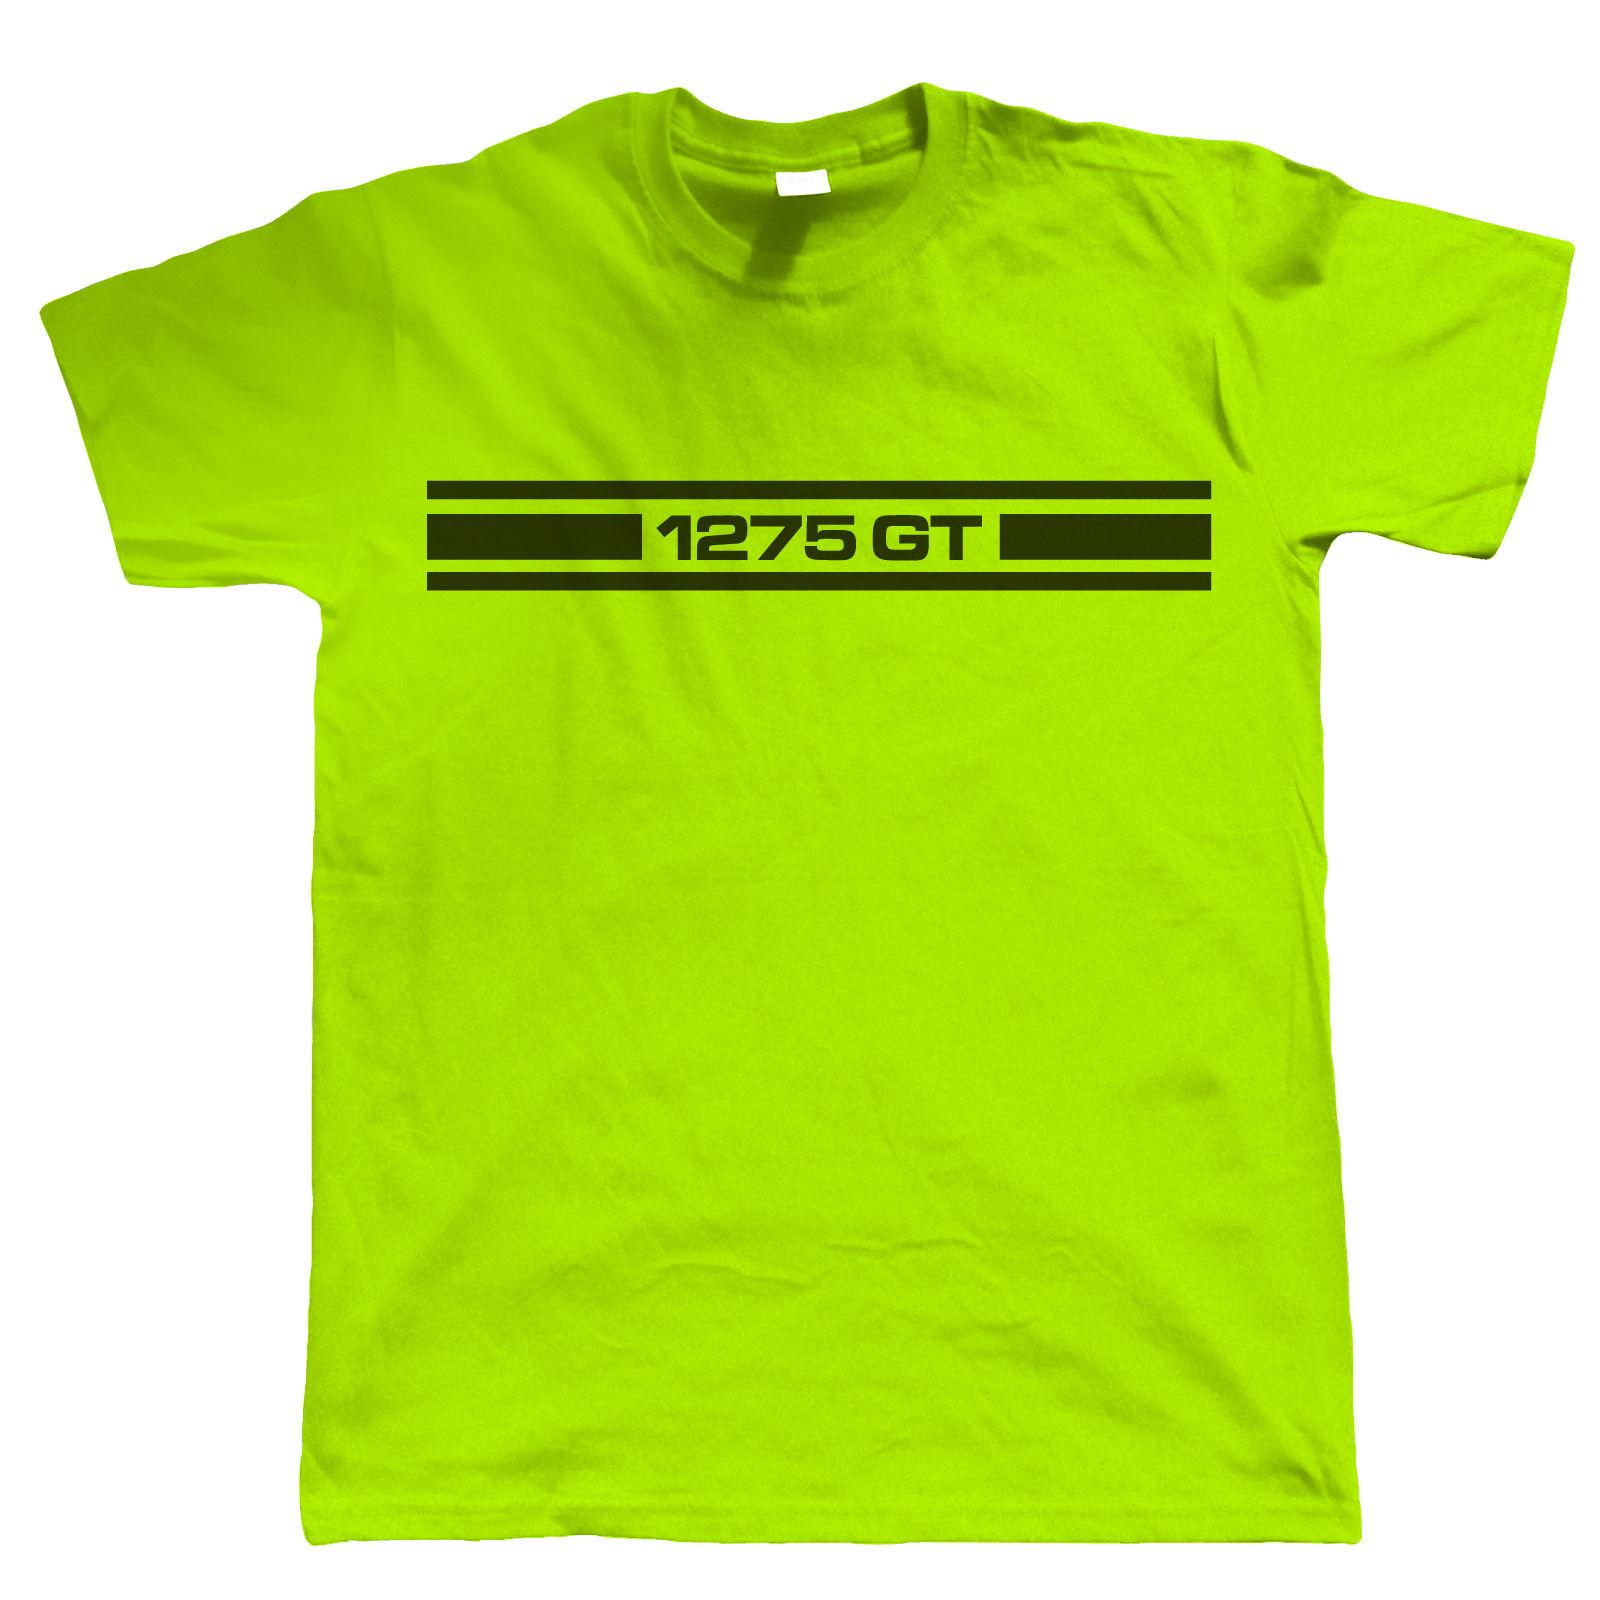 1275-GT-Stripes-Mens-Classic-Mini-T-Shirt-Clubman-A-Series